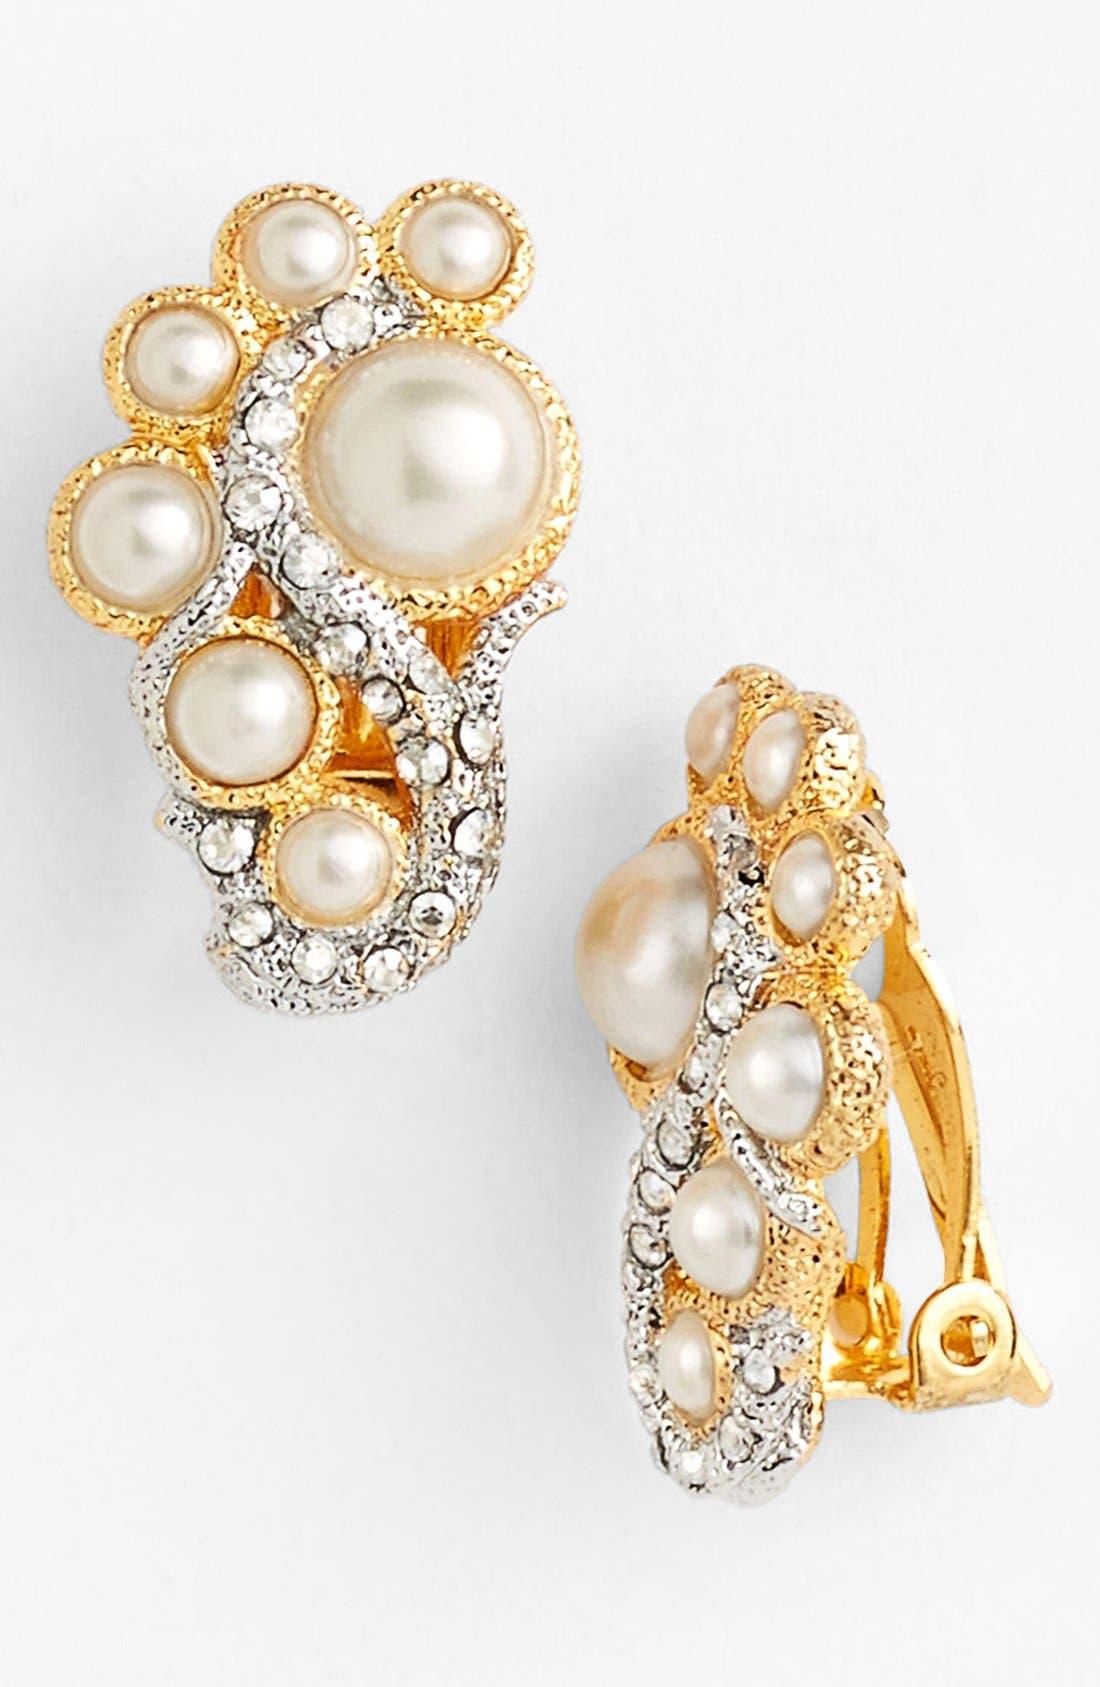 Alternate Image 1 Selected - Alexis Bittar 'Elements - Maldivian' Clip Earrings